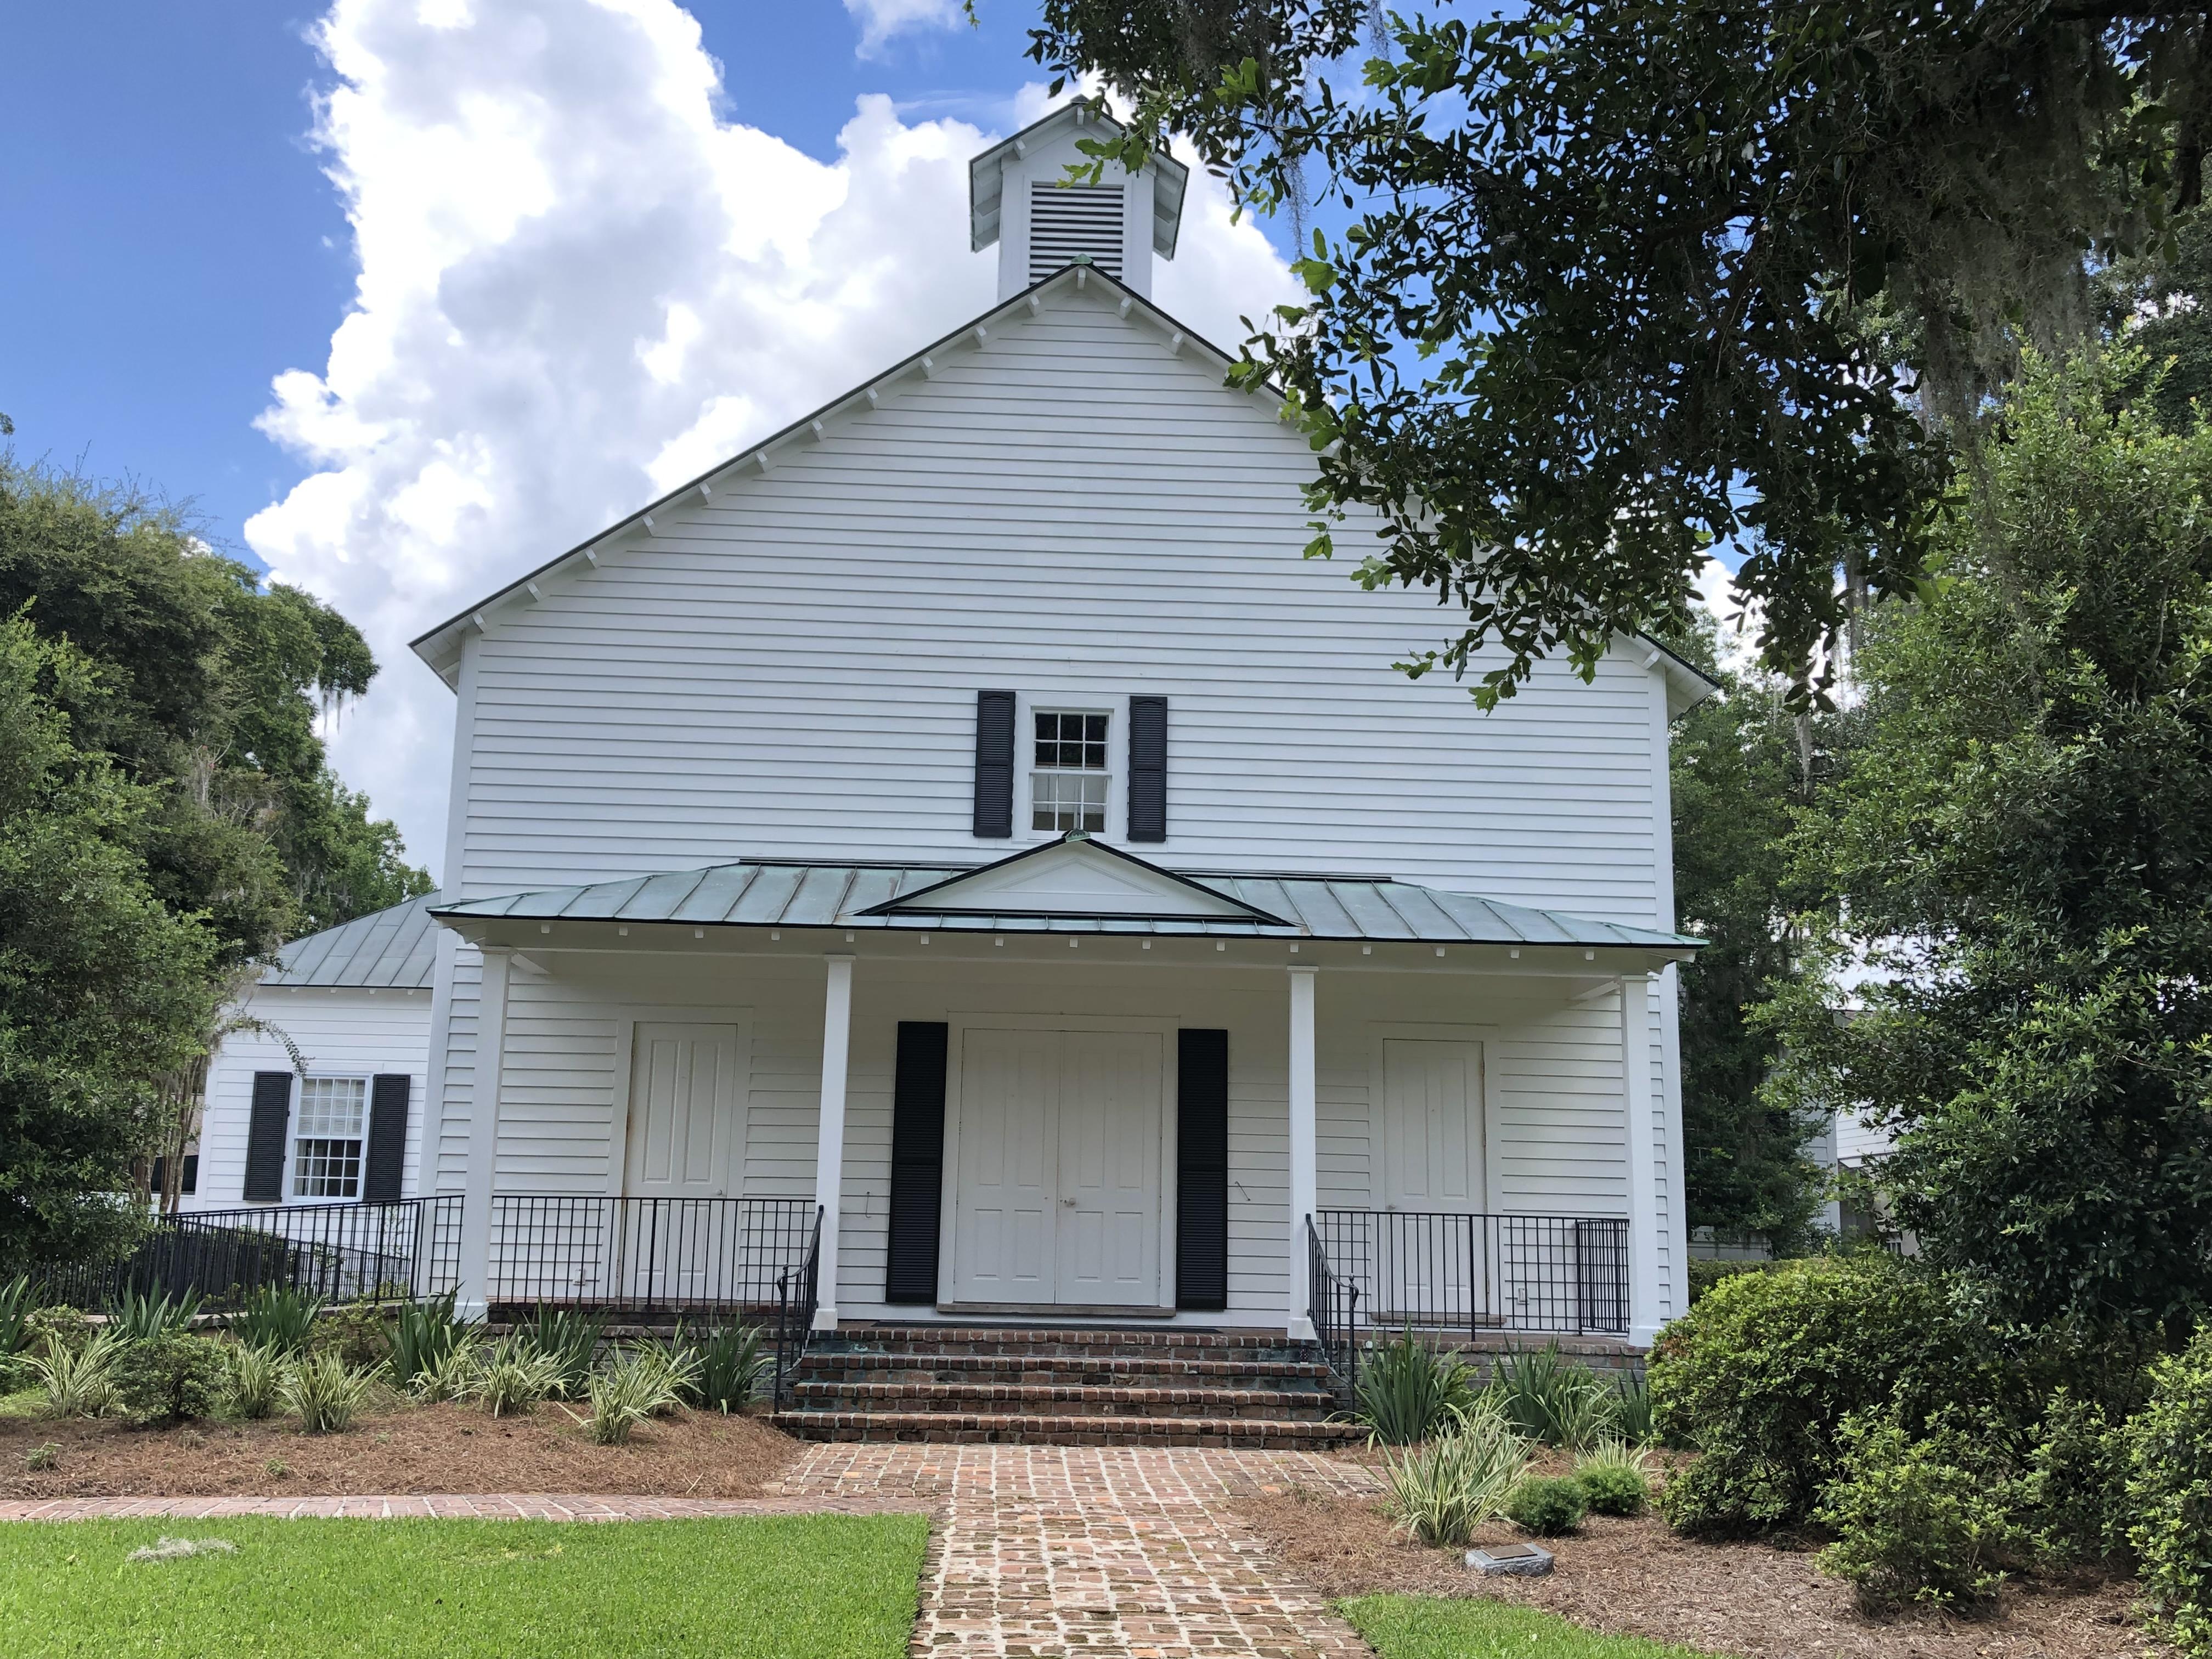 Isle Of Hope Methodist Church-1859 —